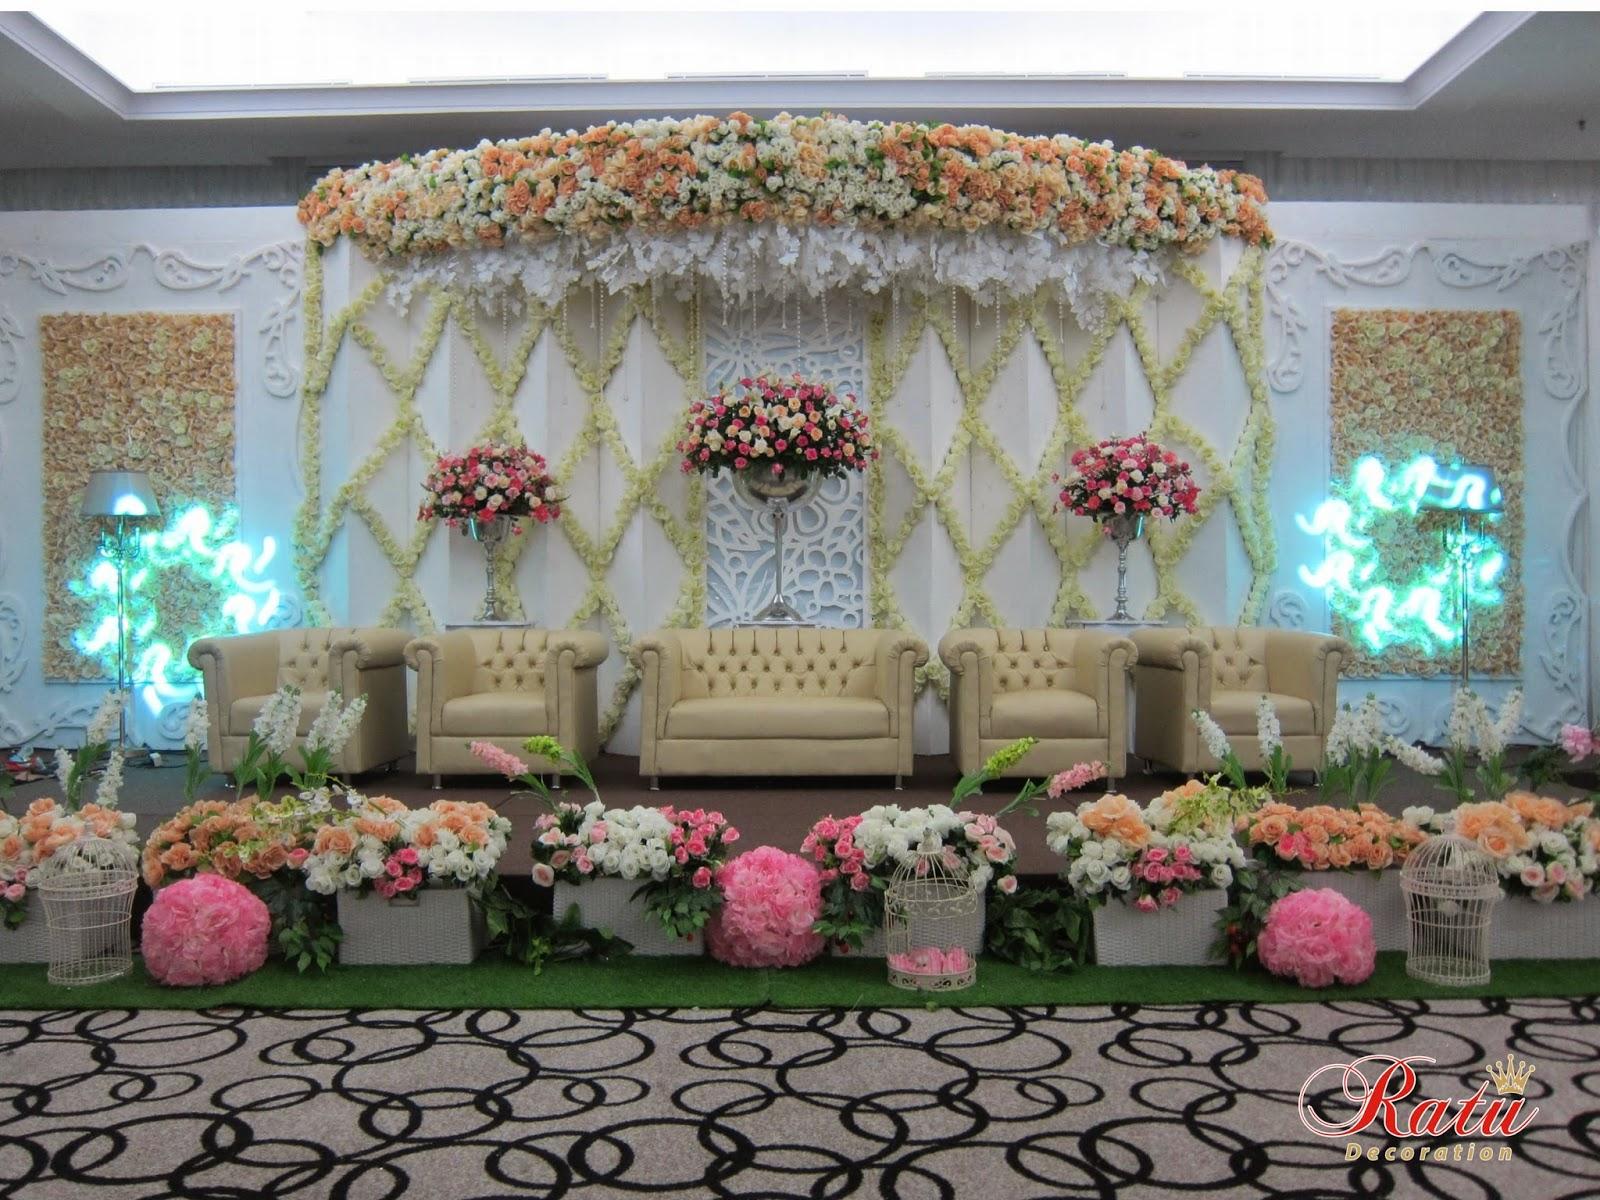 Decoration bandung 28 images magenta wedding decoration bandung decoration junglespirit Choice Image